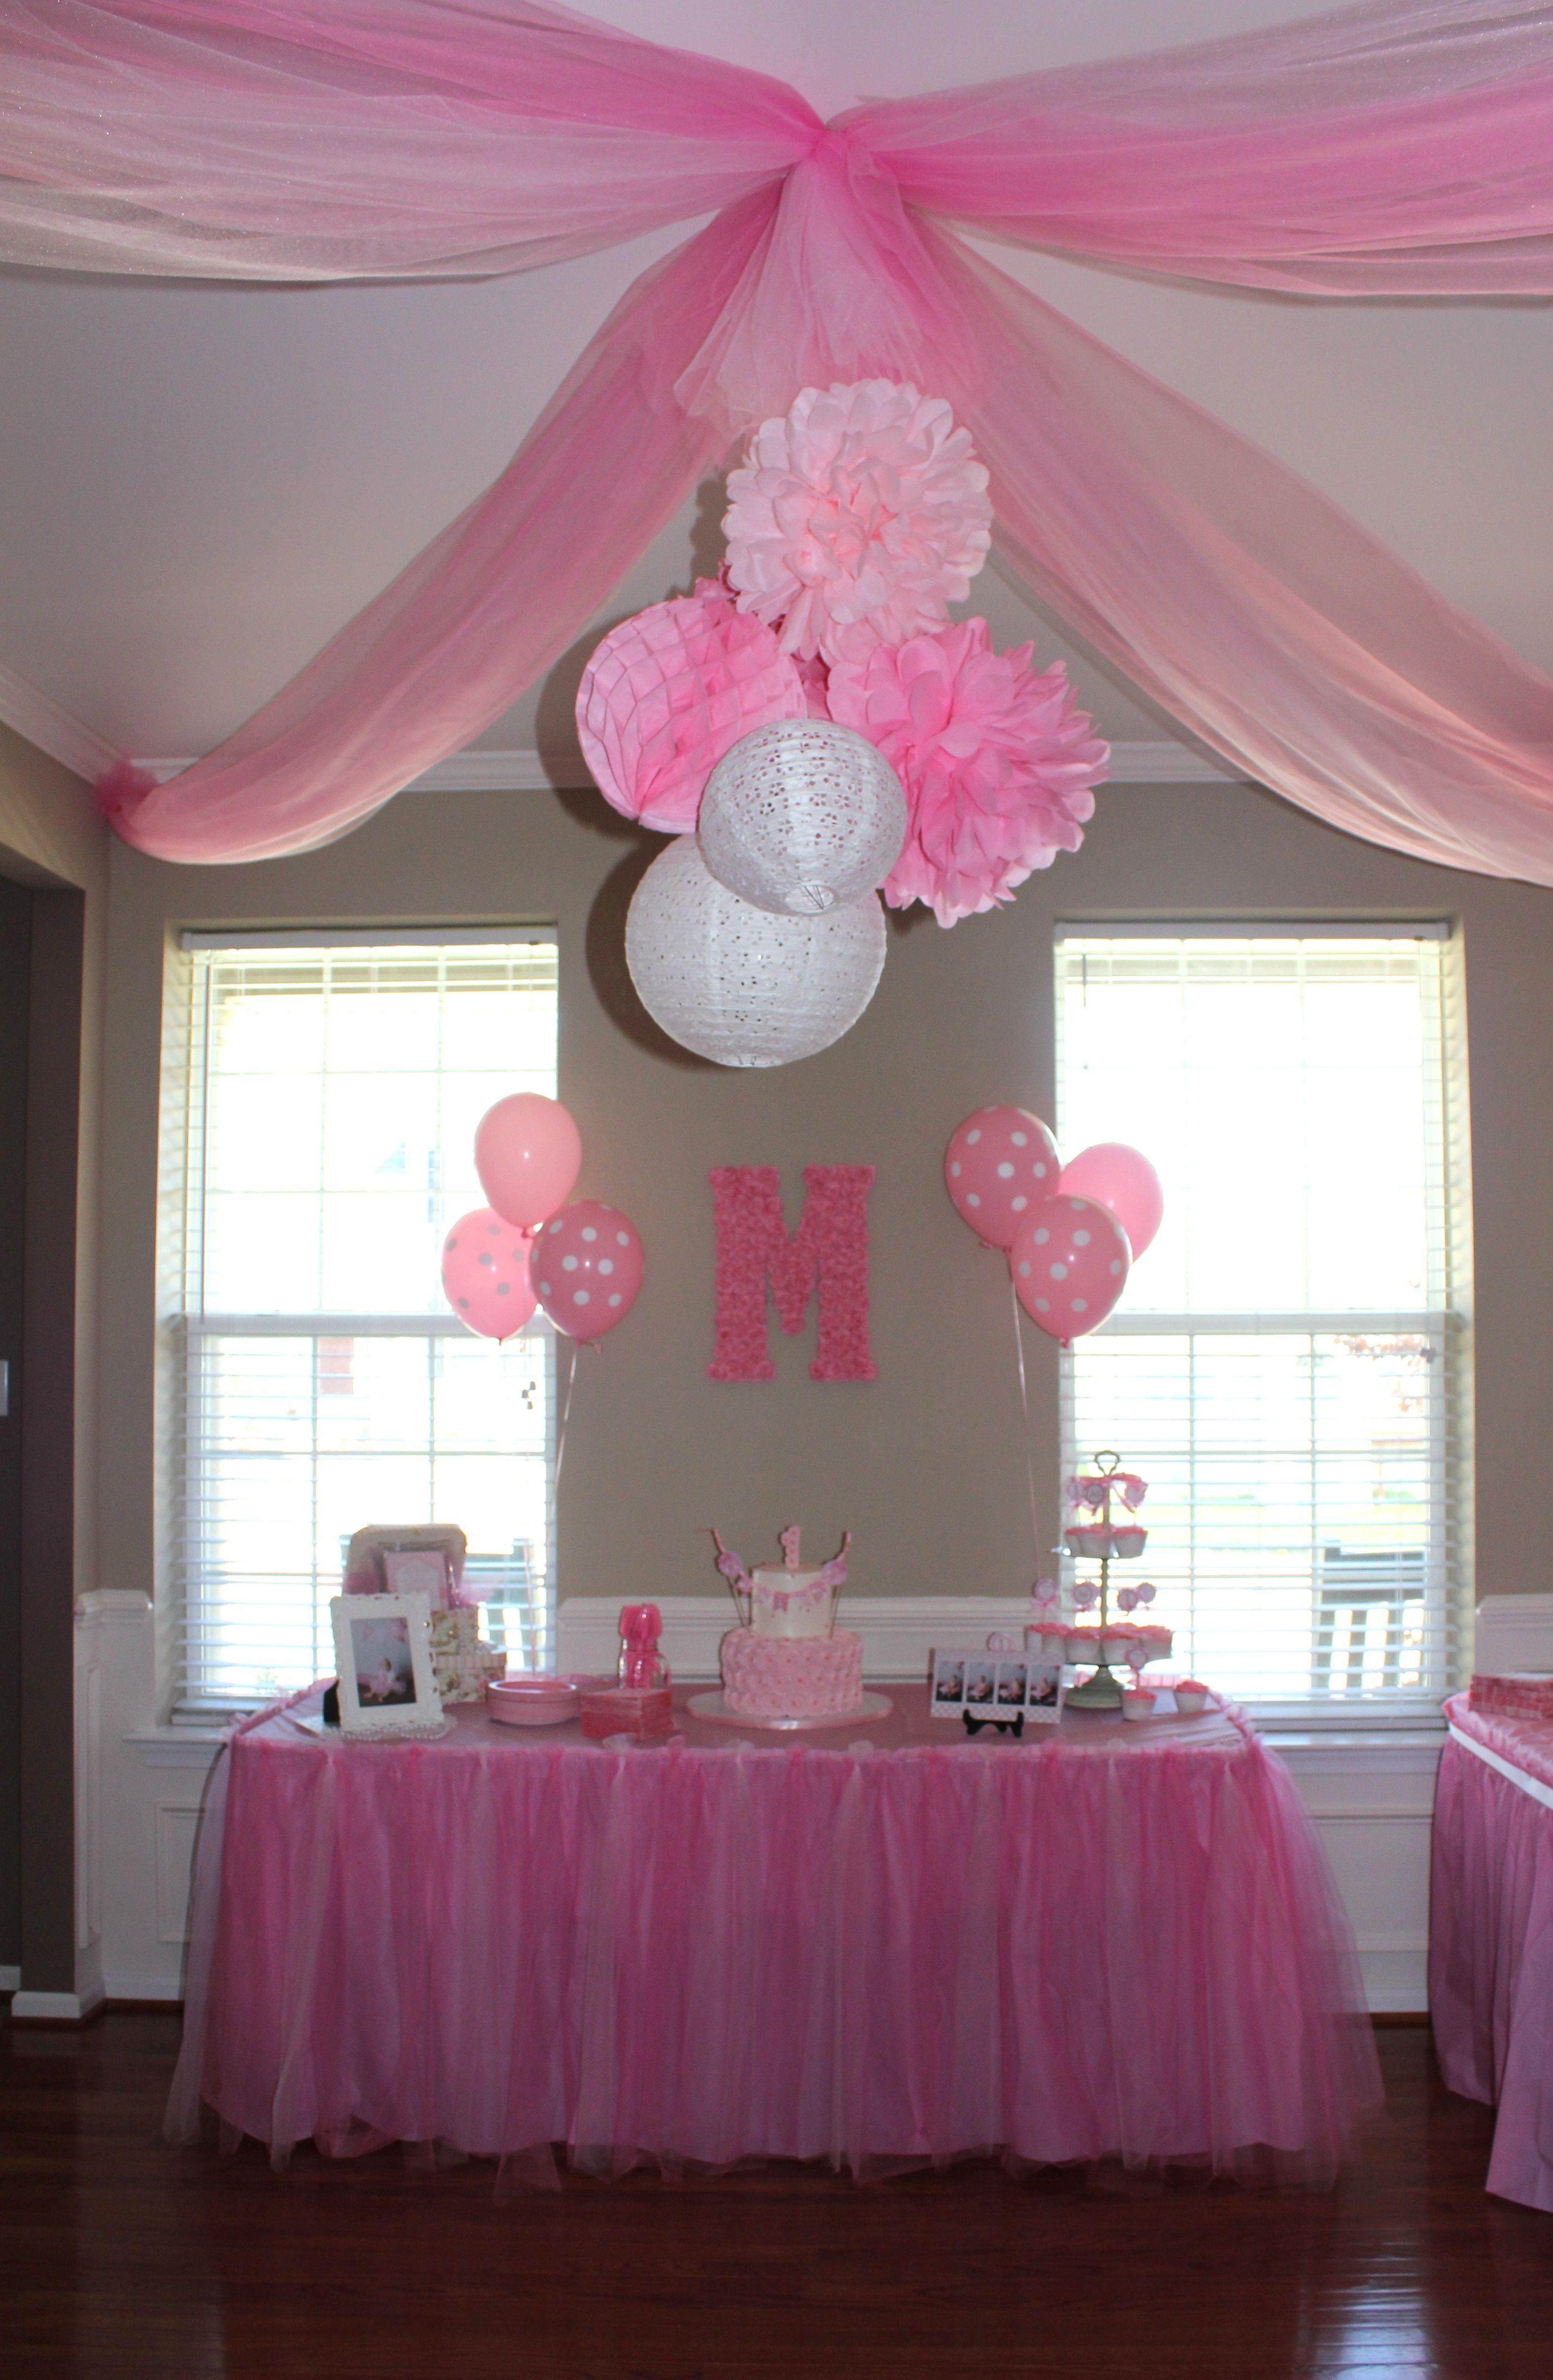 M S Pretty In Pink Party Baby Jayden Pinterest Pink